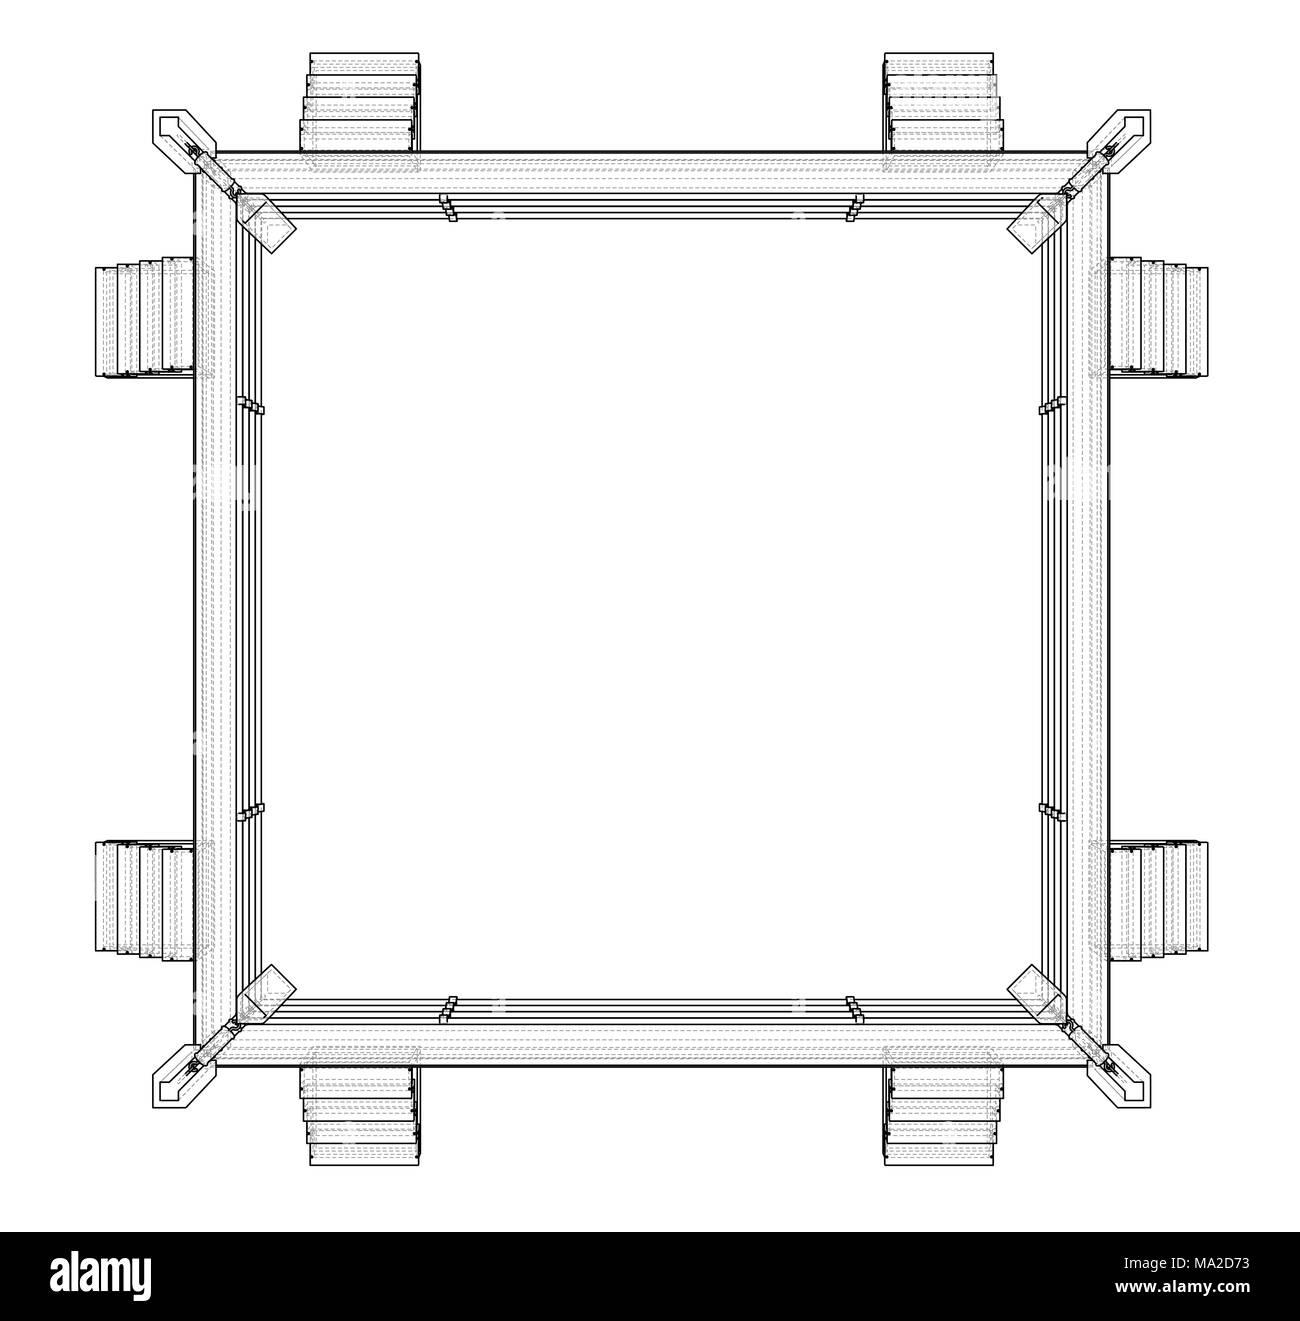 Boxing ring on white background 3d illustration wire frame style boxing ring on white background 3d illustration wire frame style ccuart Images